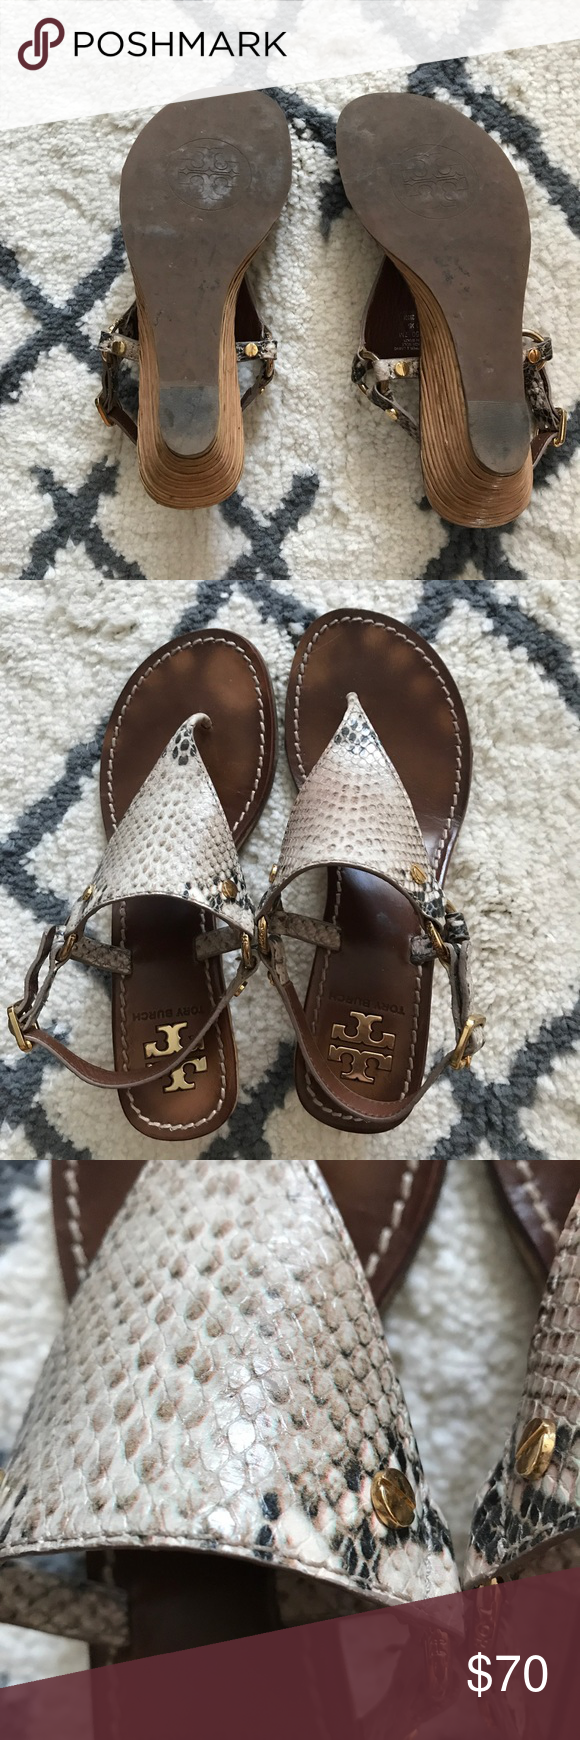 e1531cc6b76bd Tori Birch Snakeskin Wedge Sandals Tori Birch Snakeskin Wedge Sandals - in good  condition - size